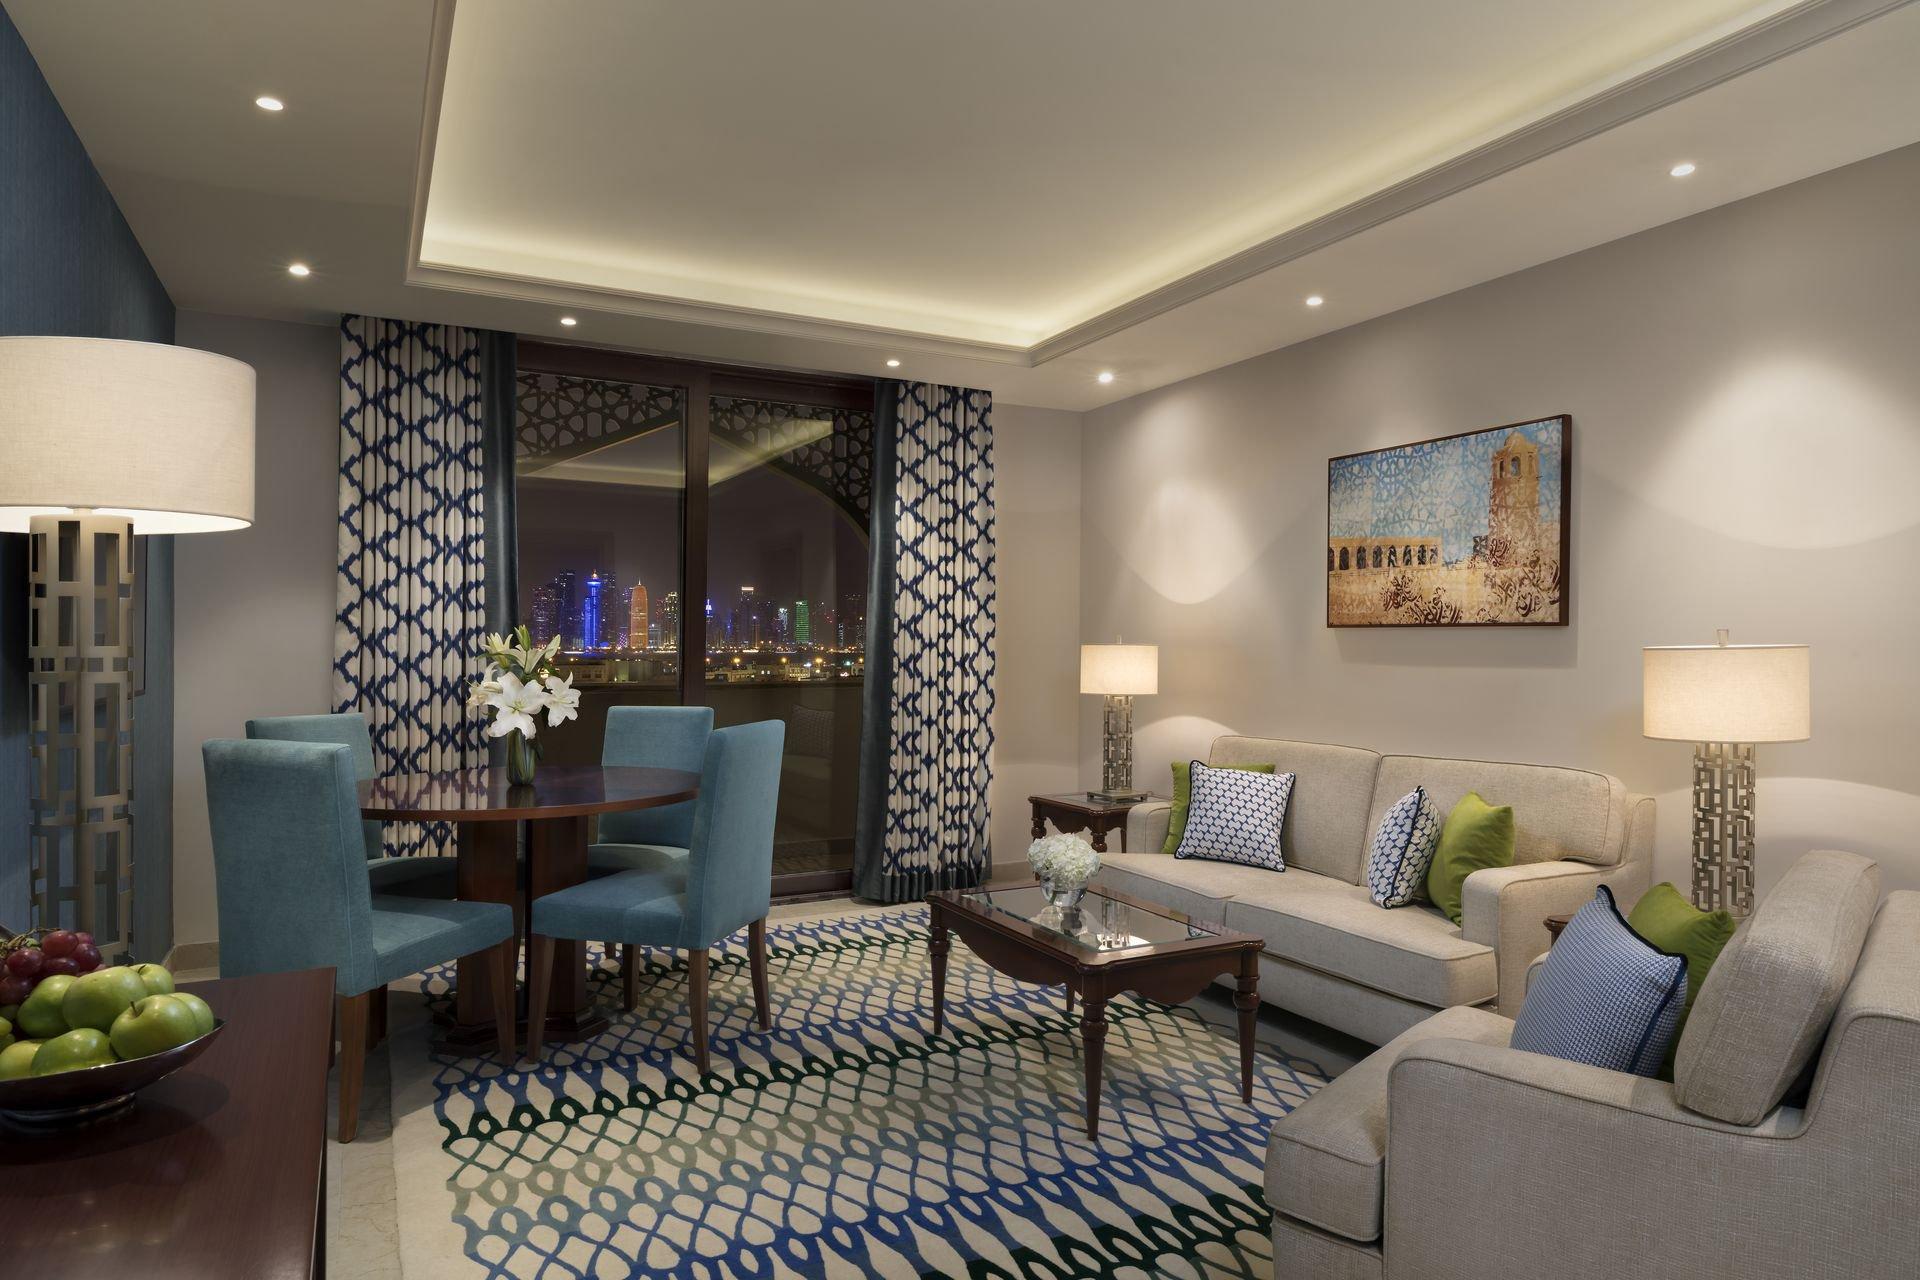 Ad Rental Apartment Doha Corniche Road (Souq Waqif), 2 ...